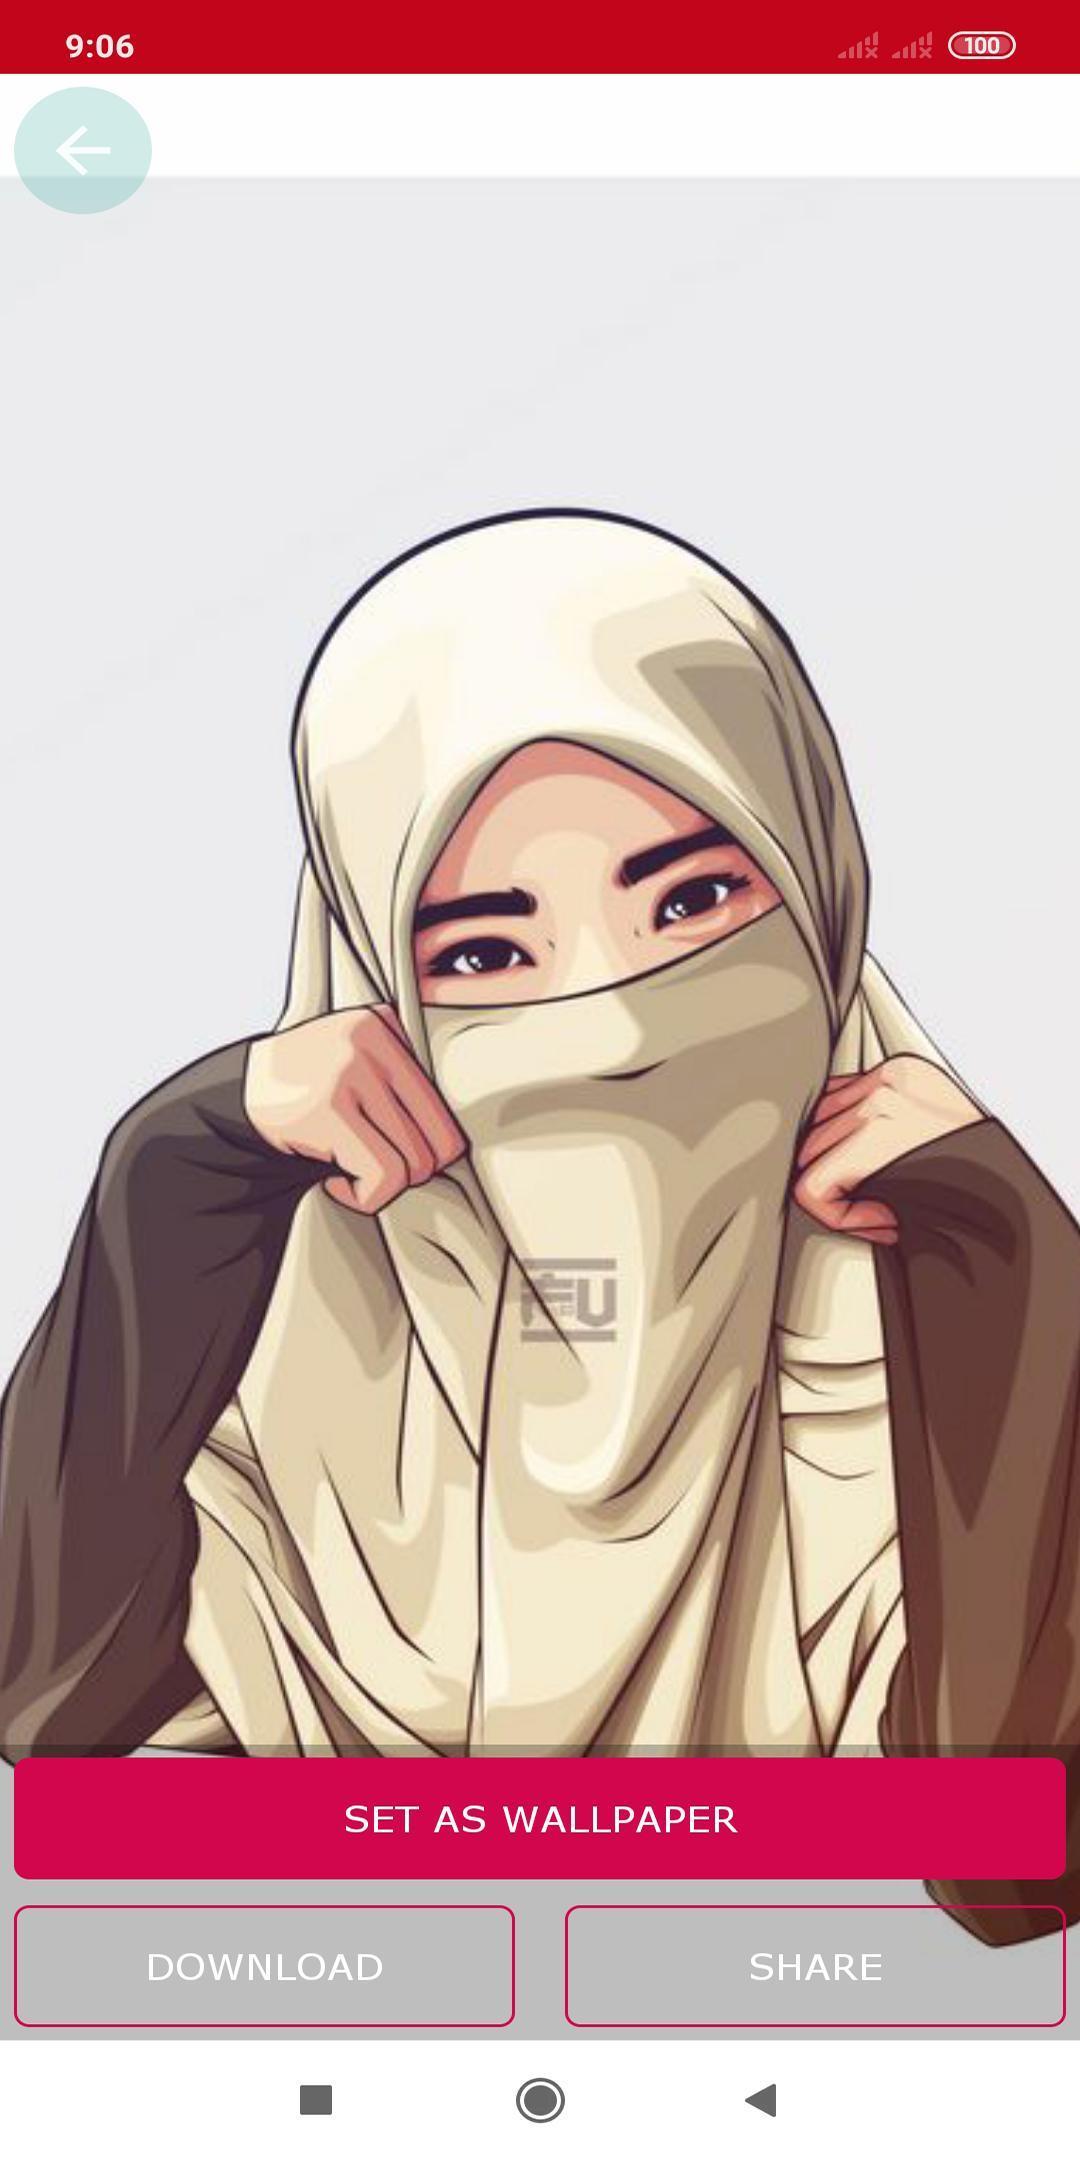 Kartun Muslimah Wallpaper HD For Android APK Download